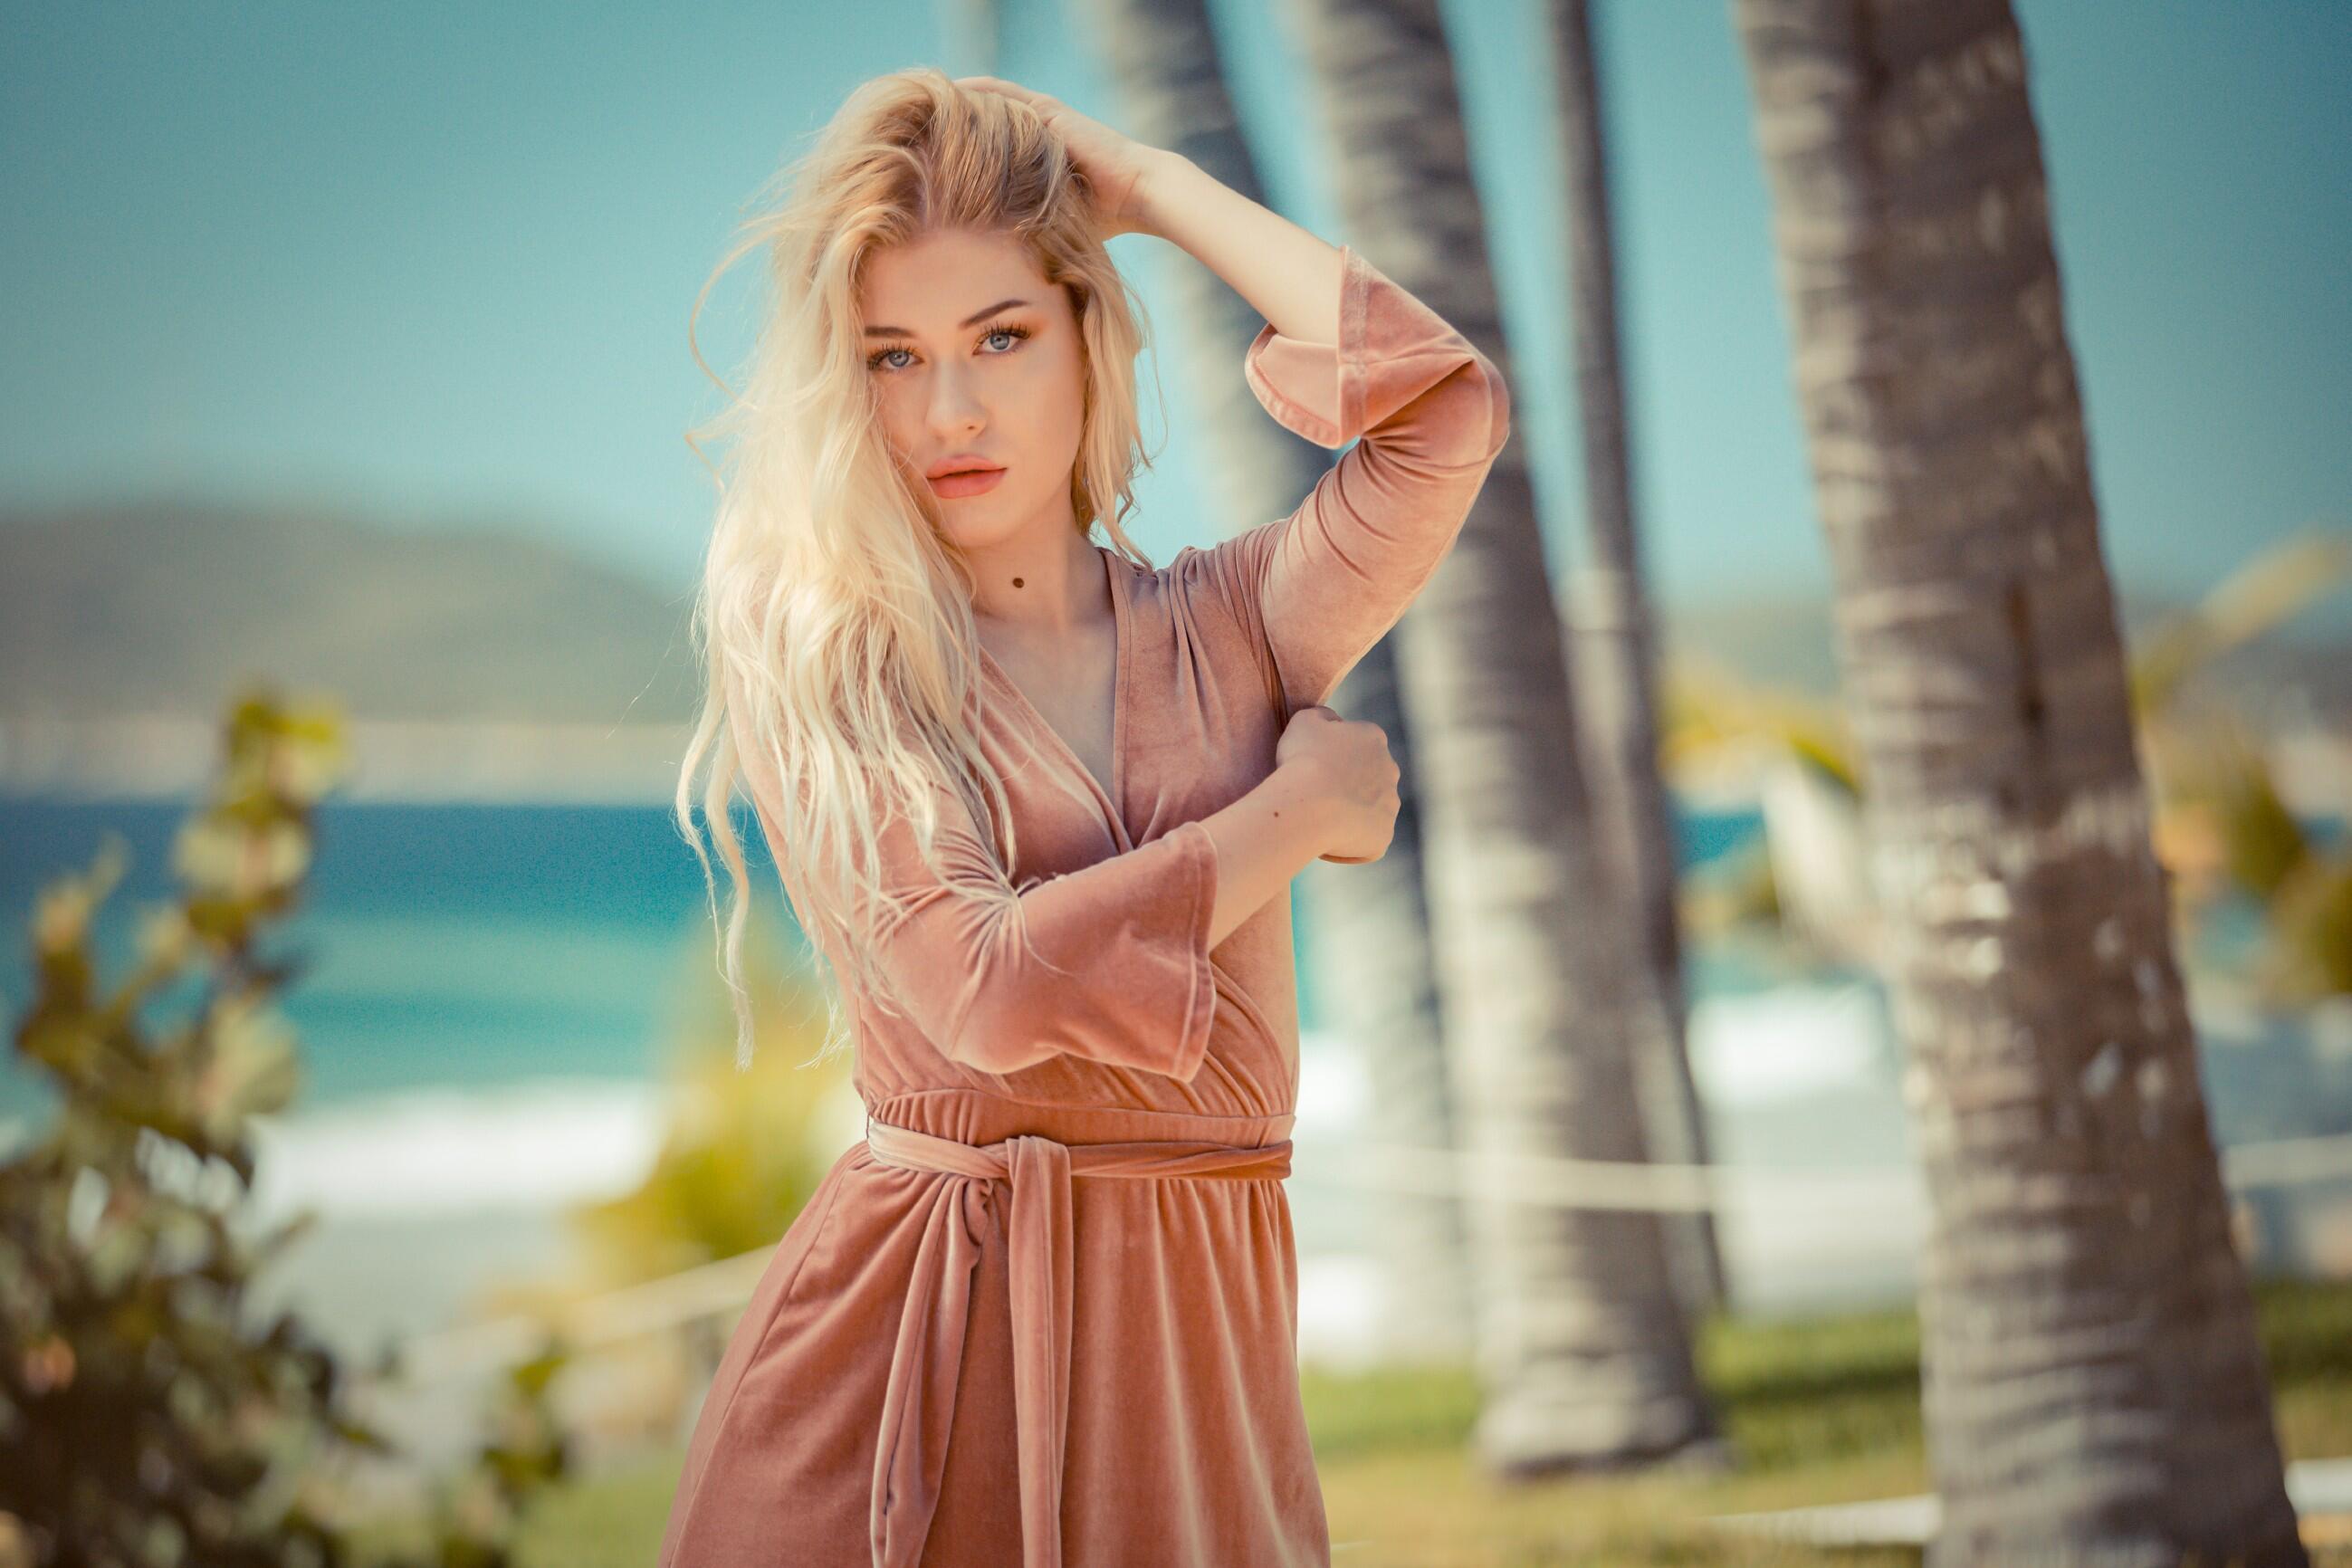 Bild zu Paradise Hotel, Show, RTL, Dating, Singles, Angela Finger-Erben,